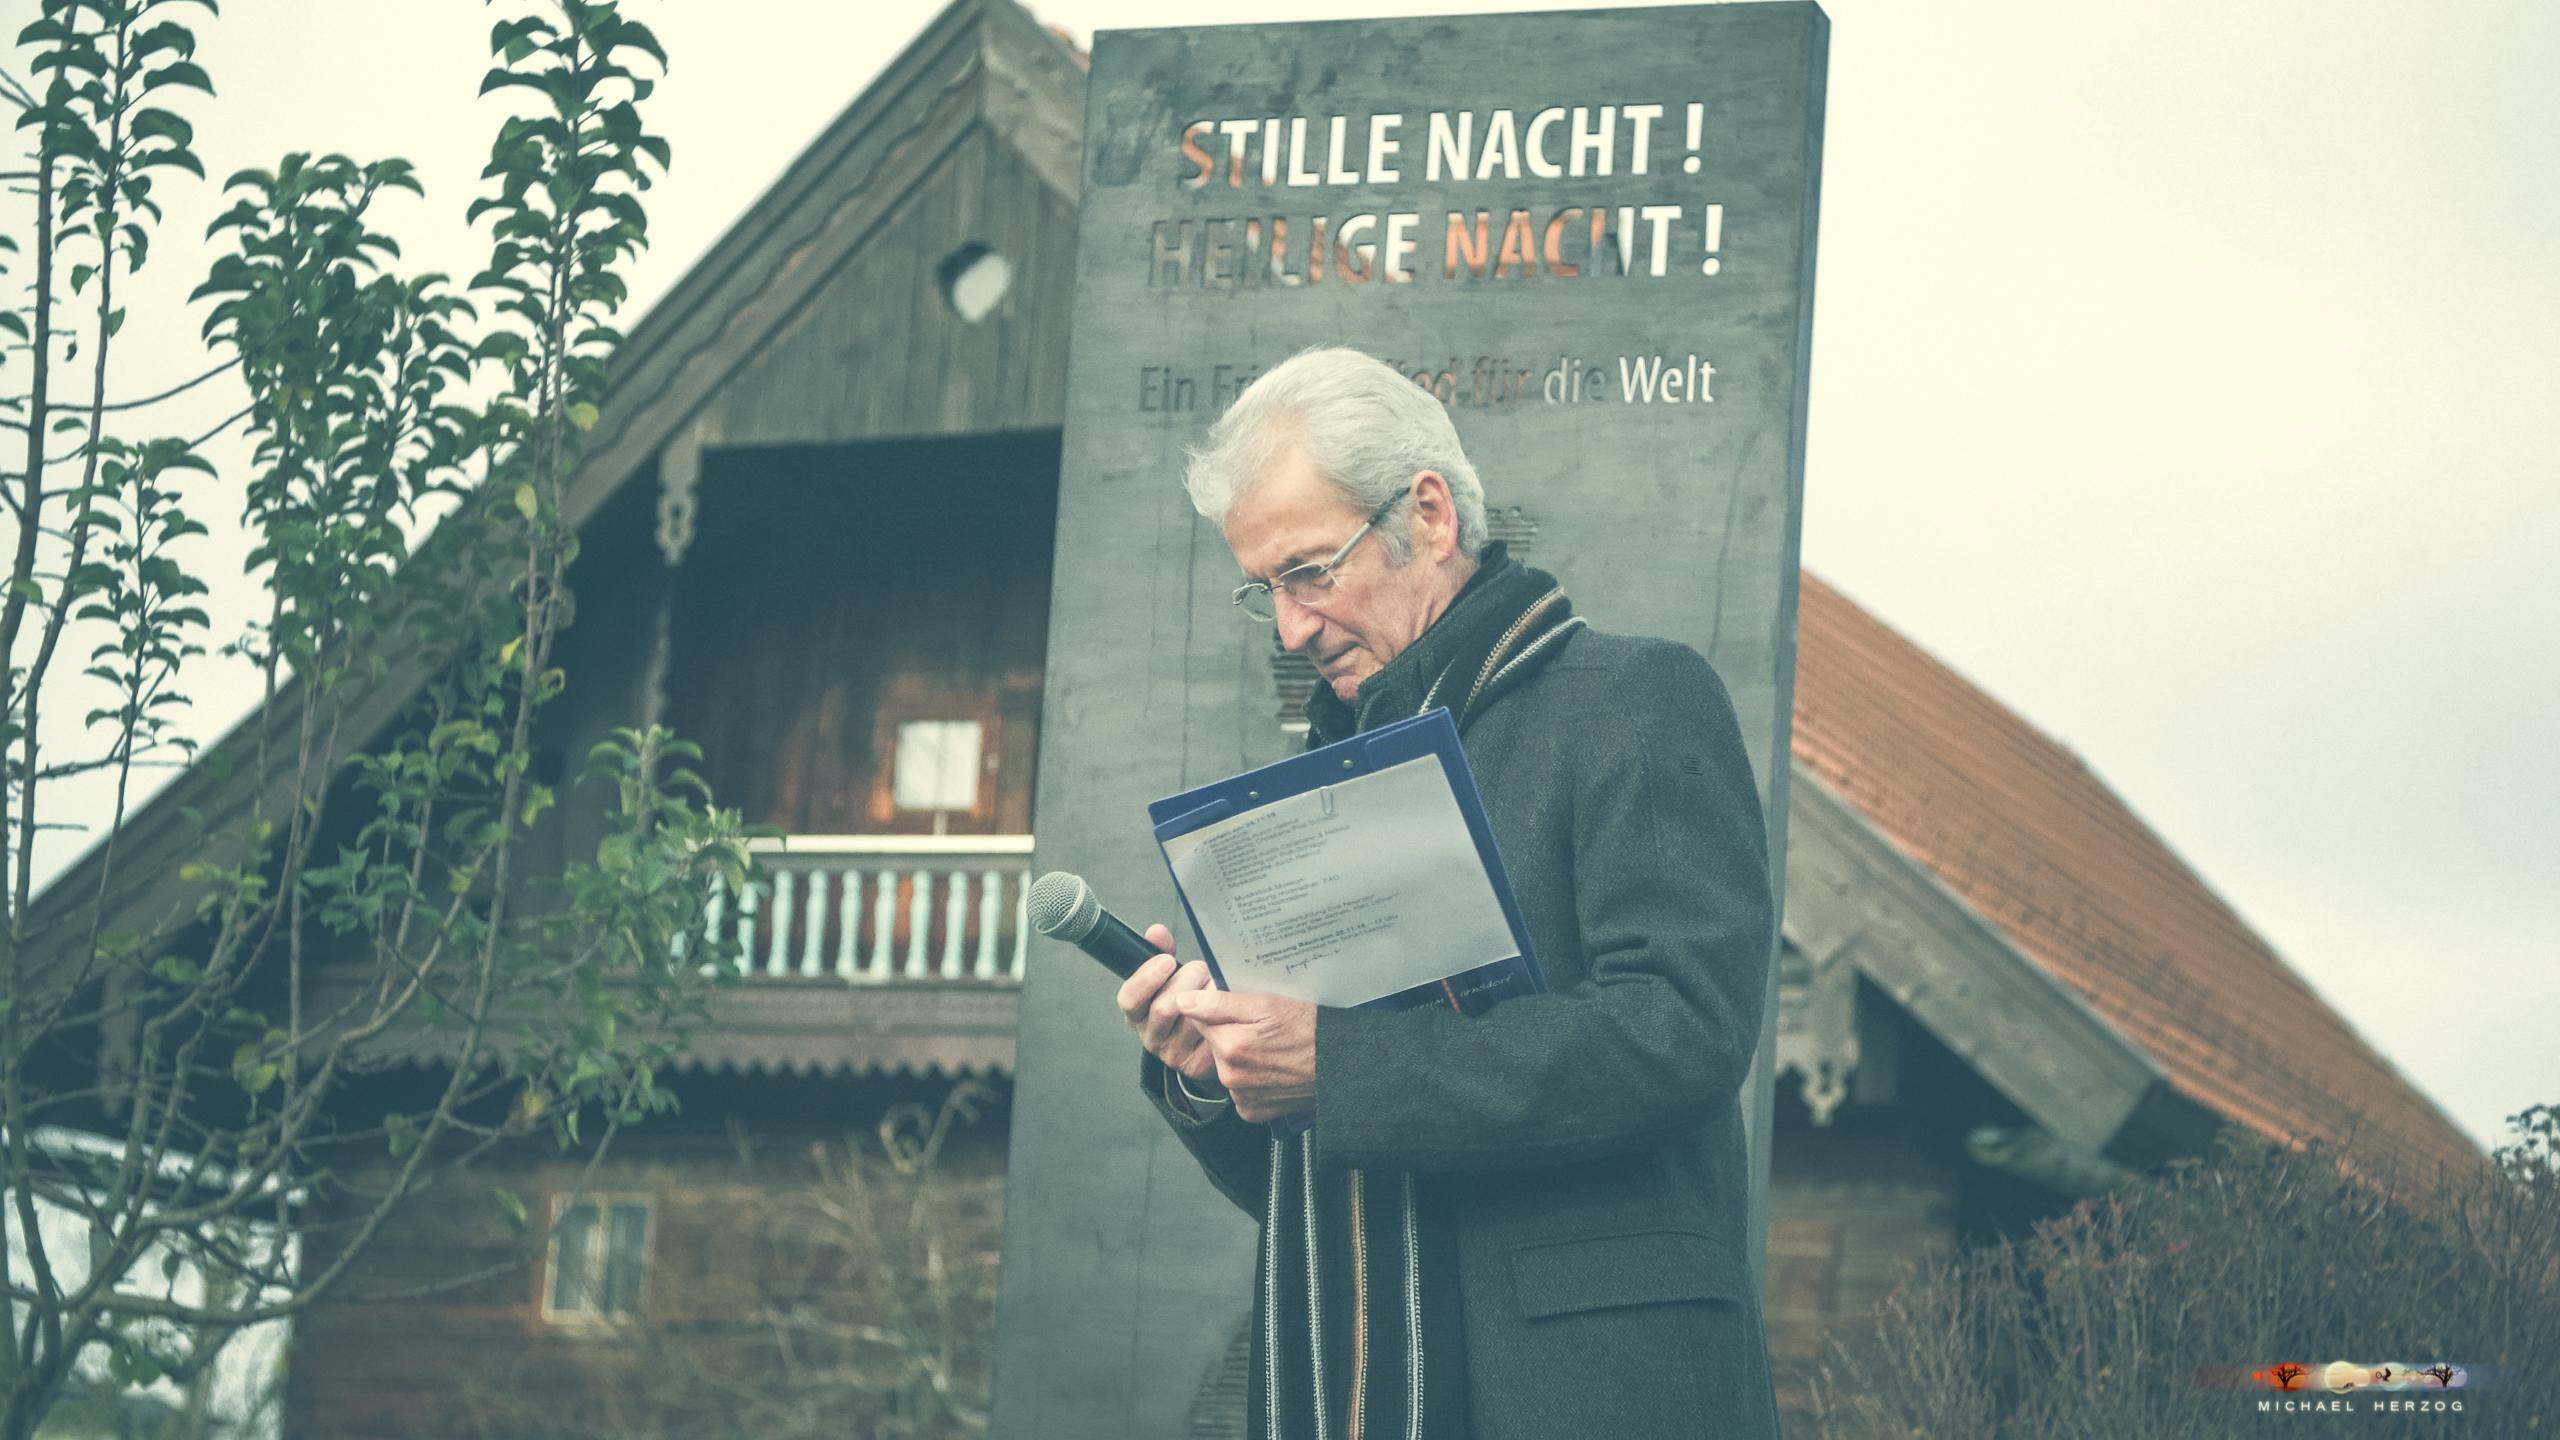 StilleNachtArnsdorf_25Nov2018_Pott-Schlager_2018_Screenshot_MichaelHerzog-05-3.jpg